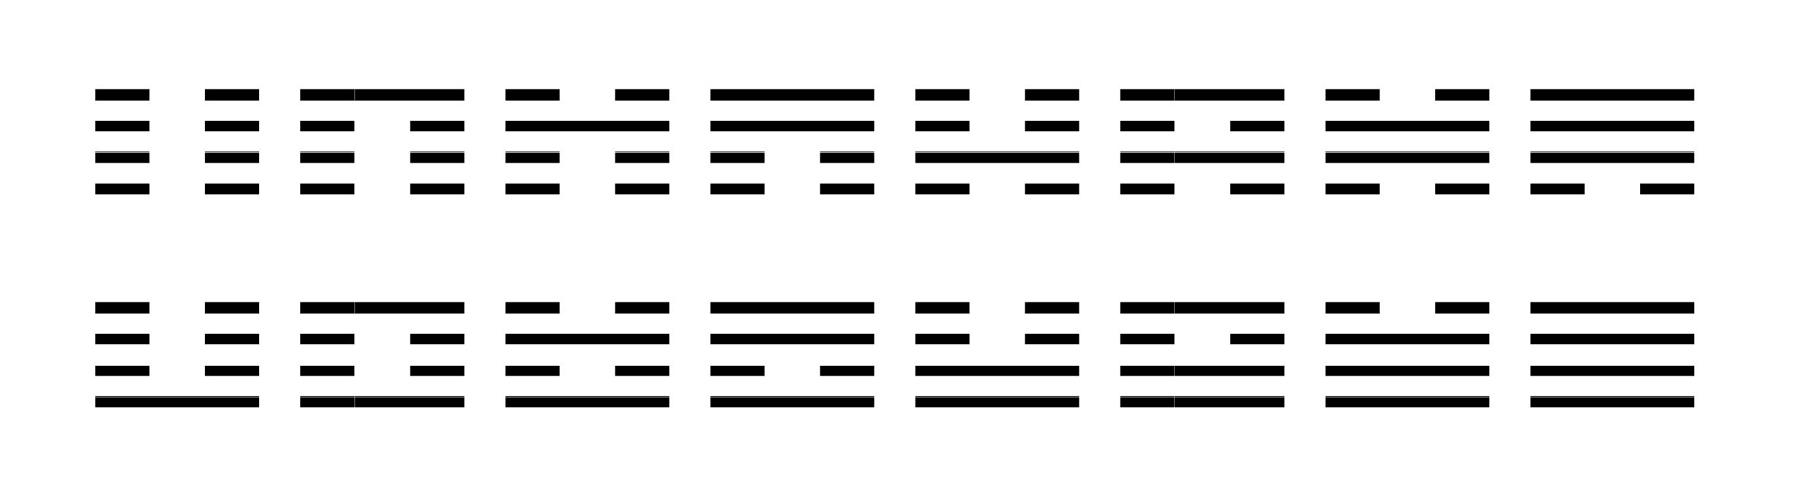 I Ching Square-1d-16x2